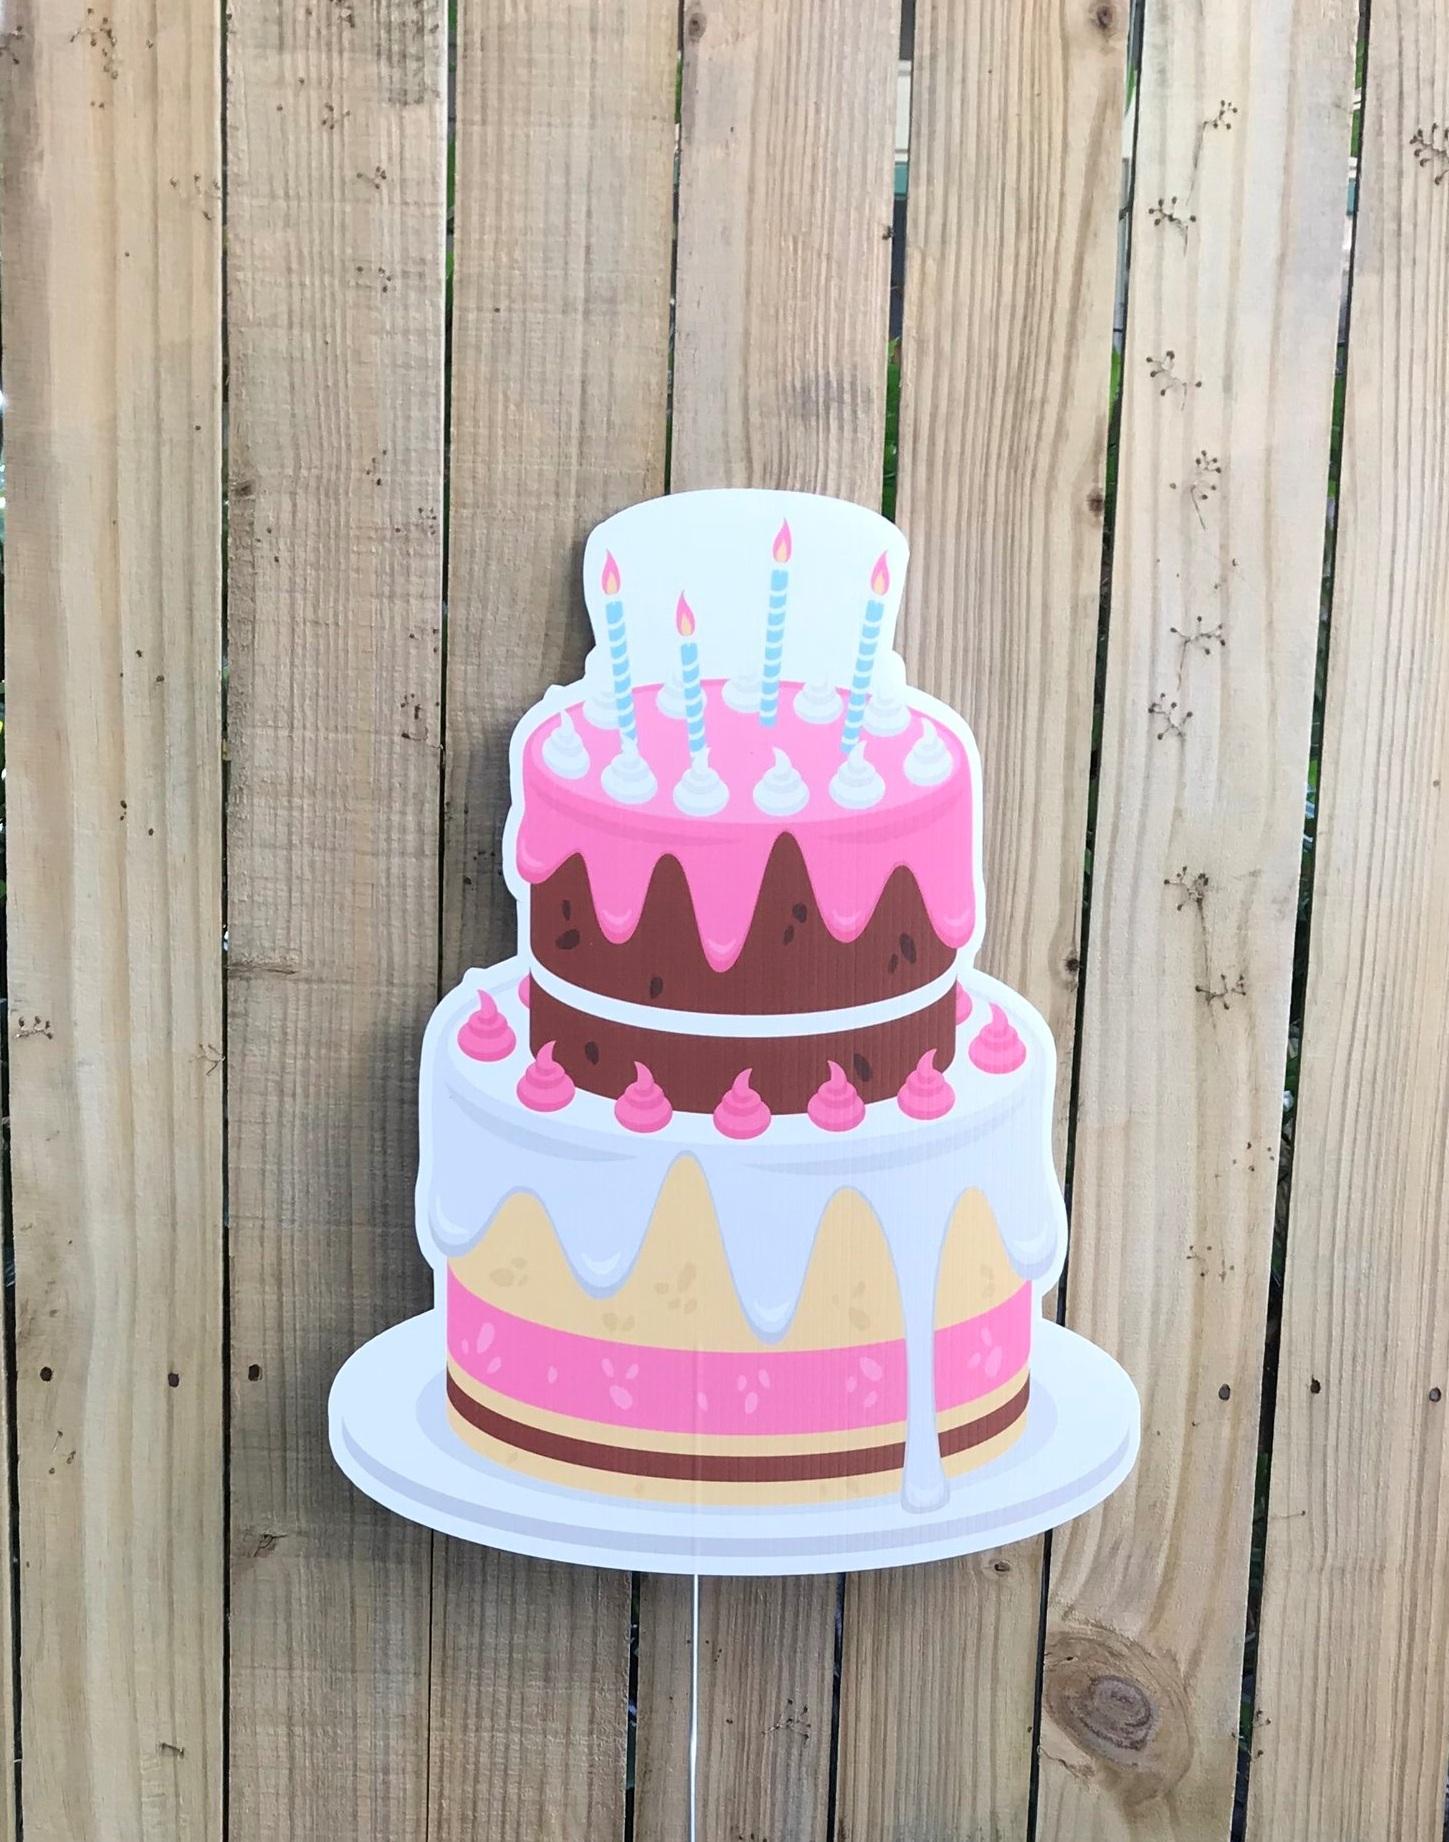 Pink Birthday Cake.jpg